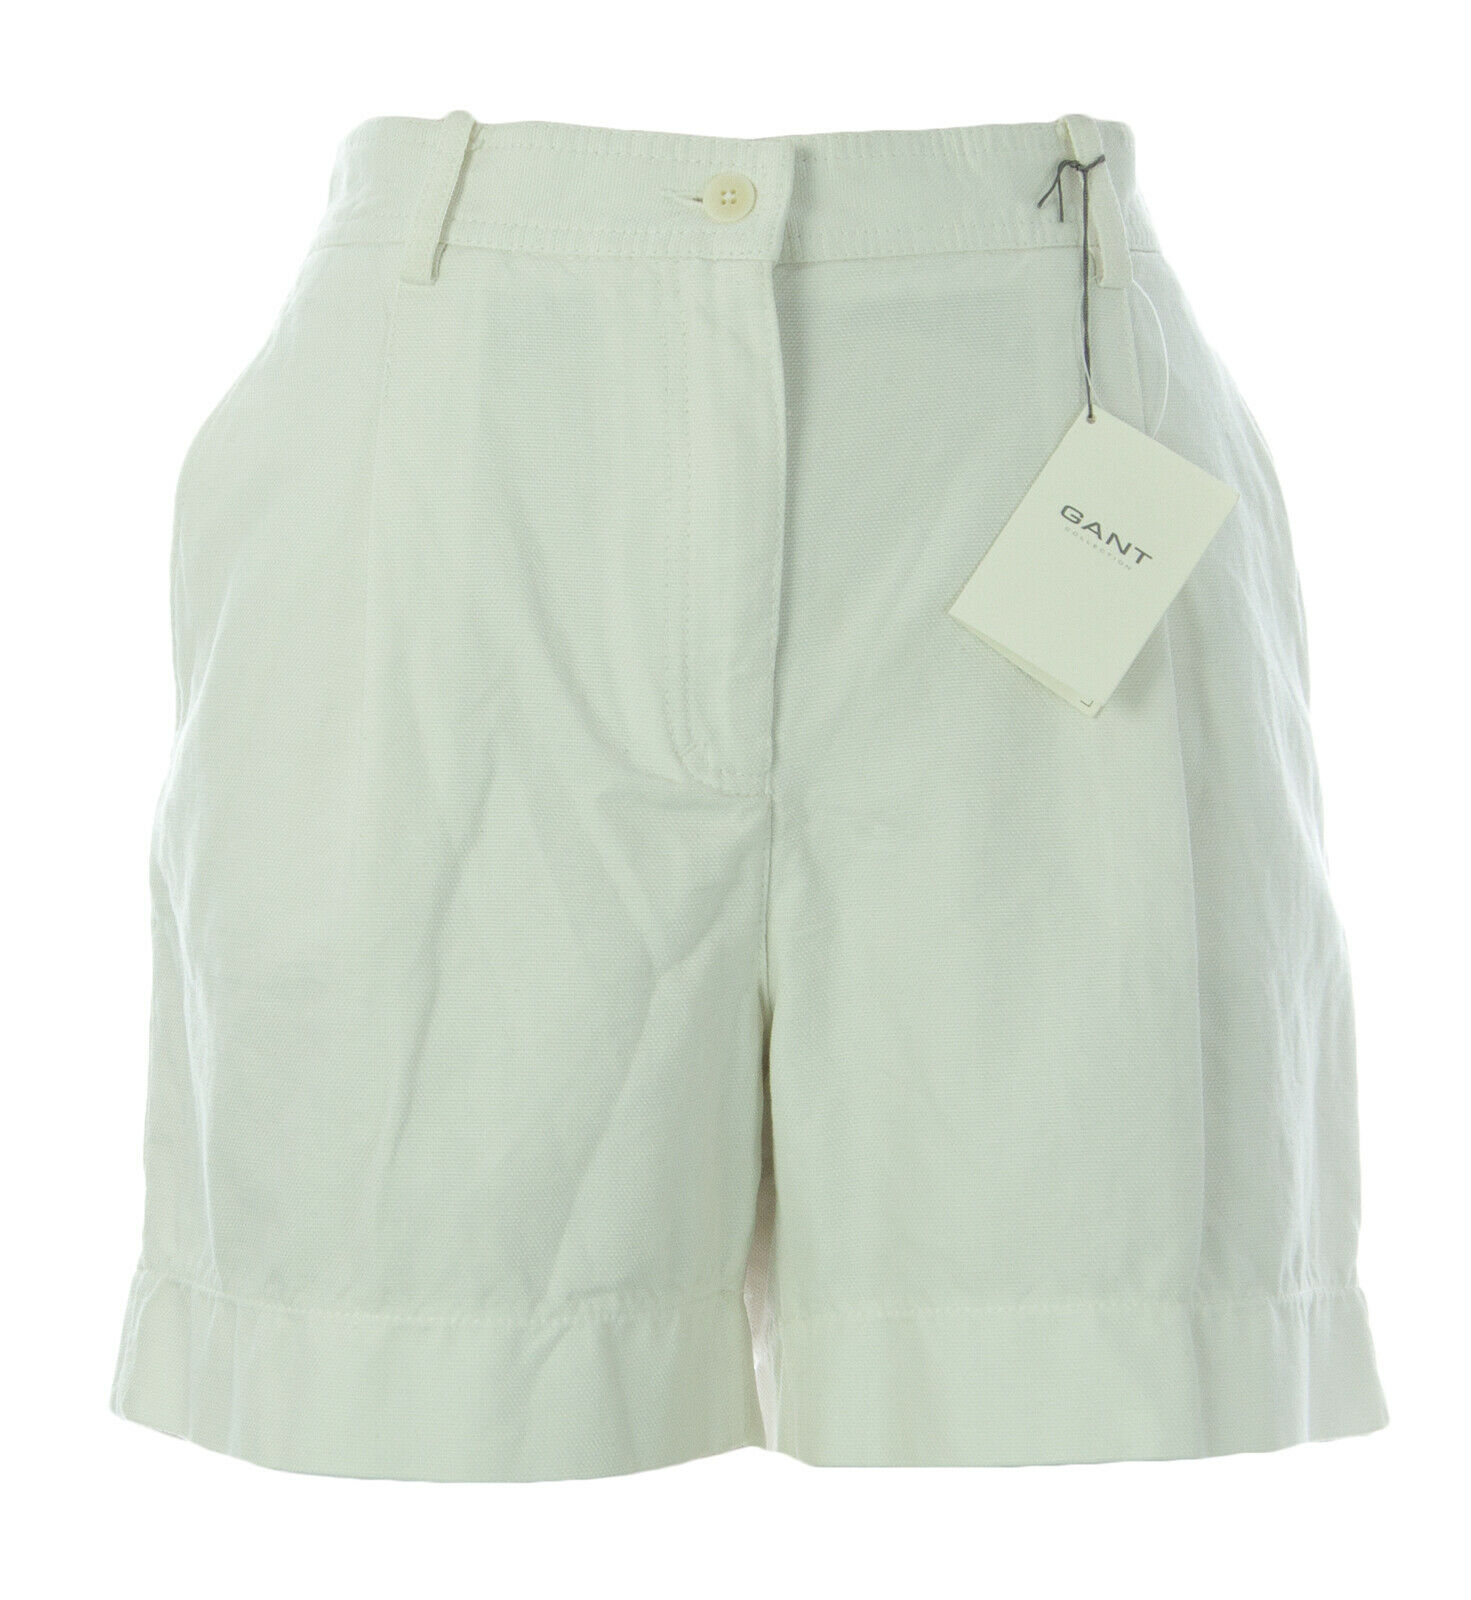 GANT Women's Eggshell Cotton Canvas Shorts 420224  NEW